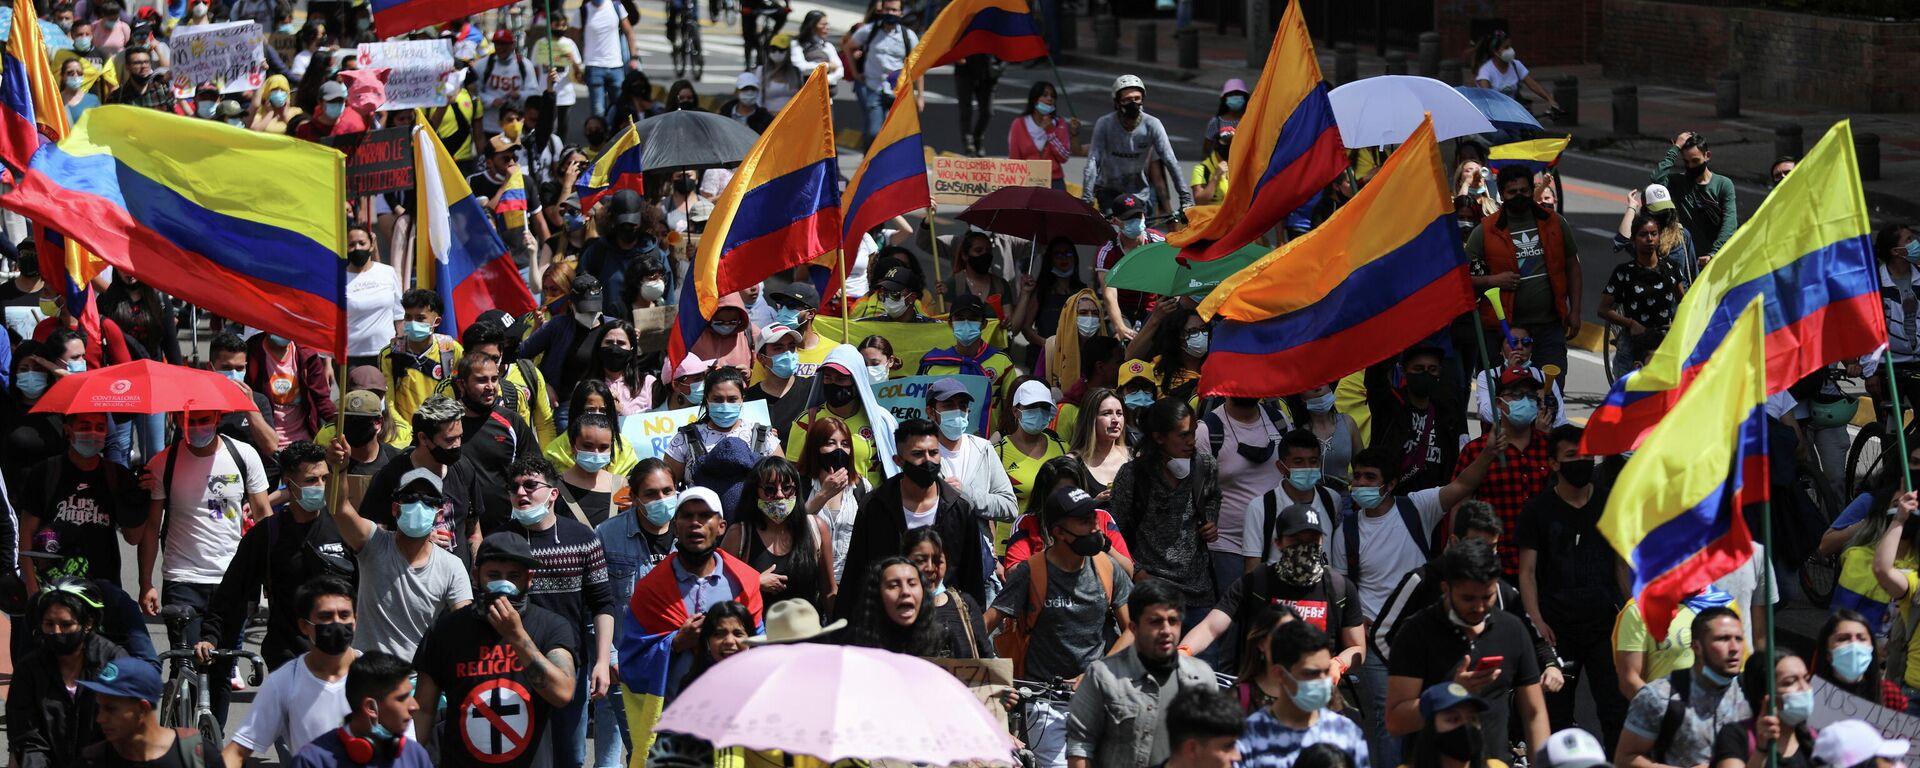 Protestas en Bogotá, Colombia - Sputnik Mundo, 1920, 12.05.2021